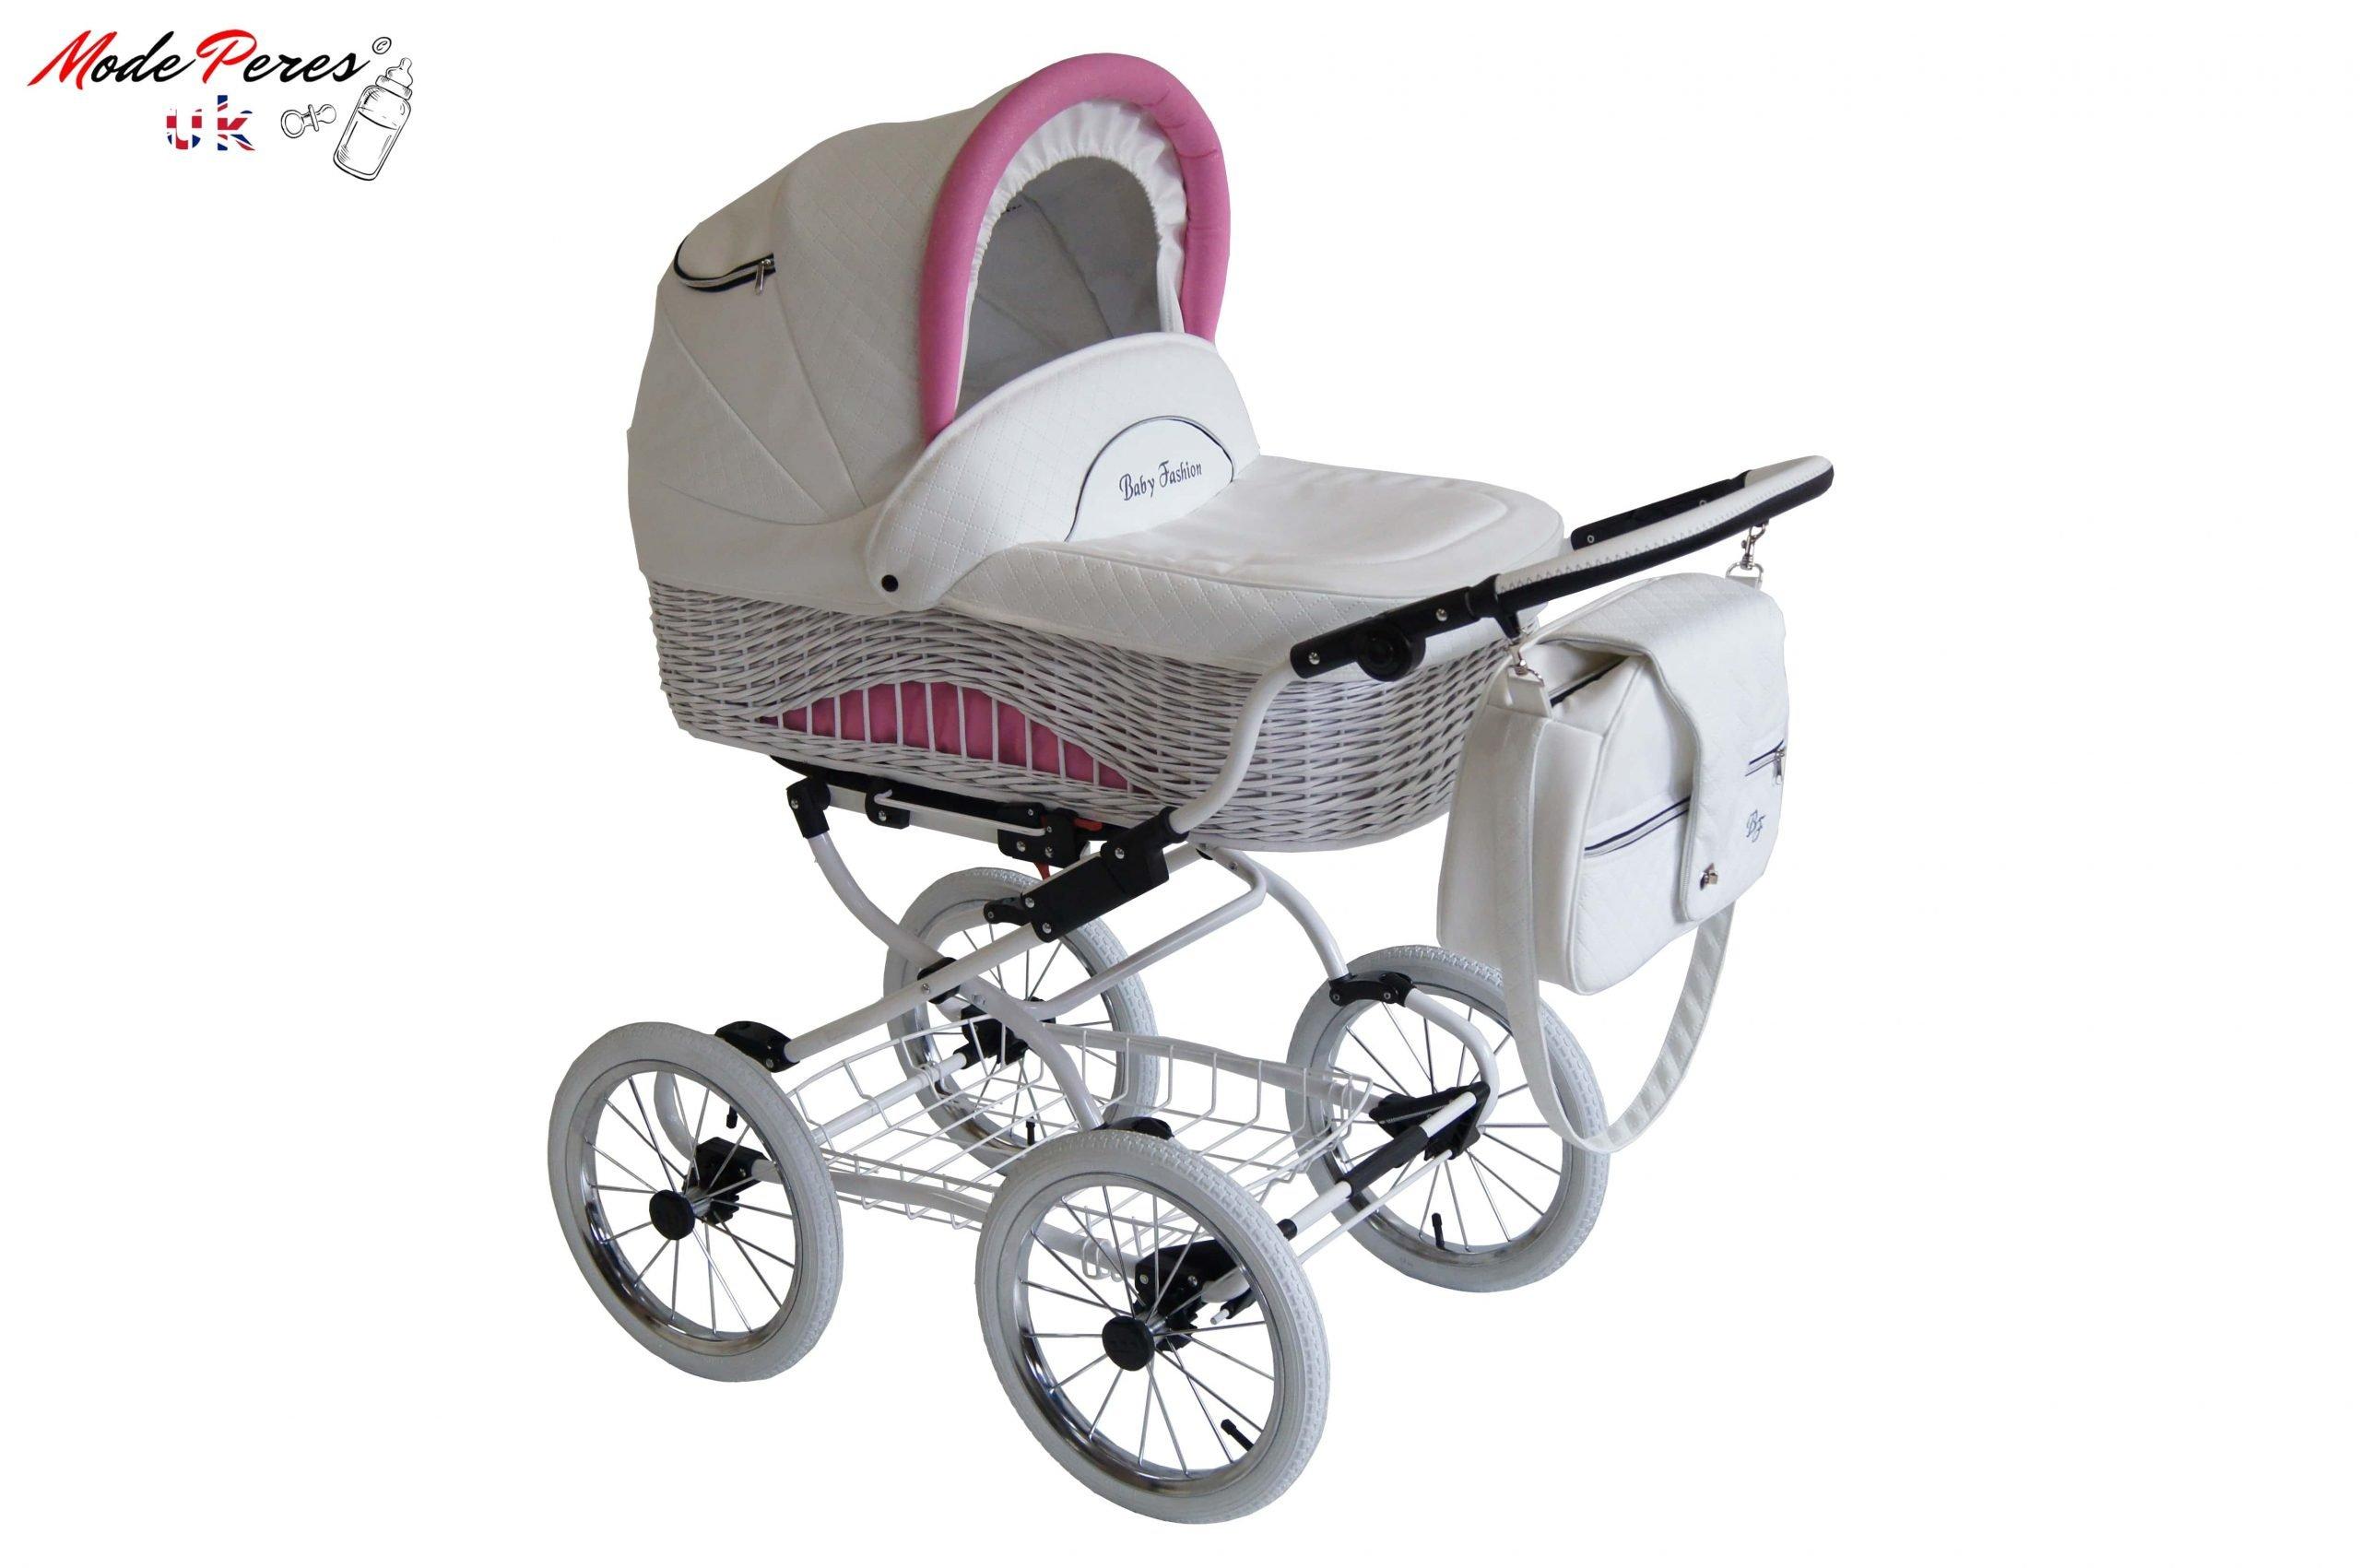 New Baby Pram Lirdo 3in1 Stroller Pushchair Car Seat Carrycot Travel System